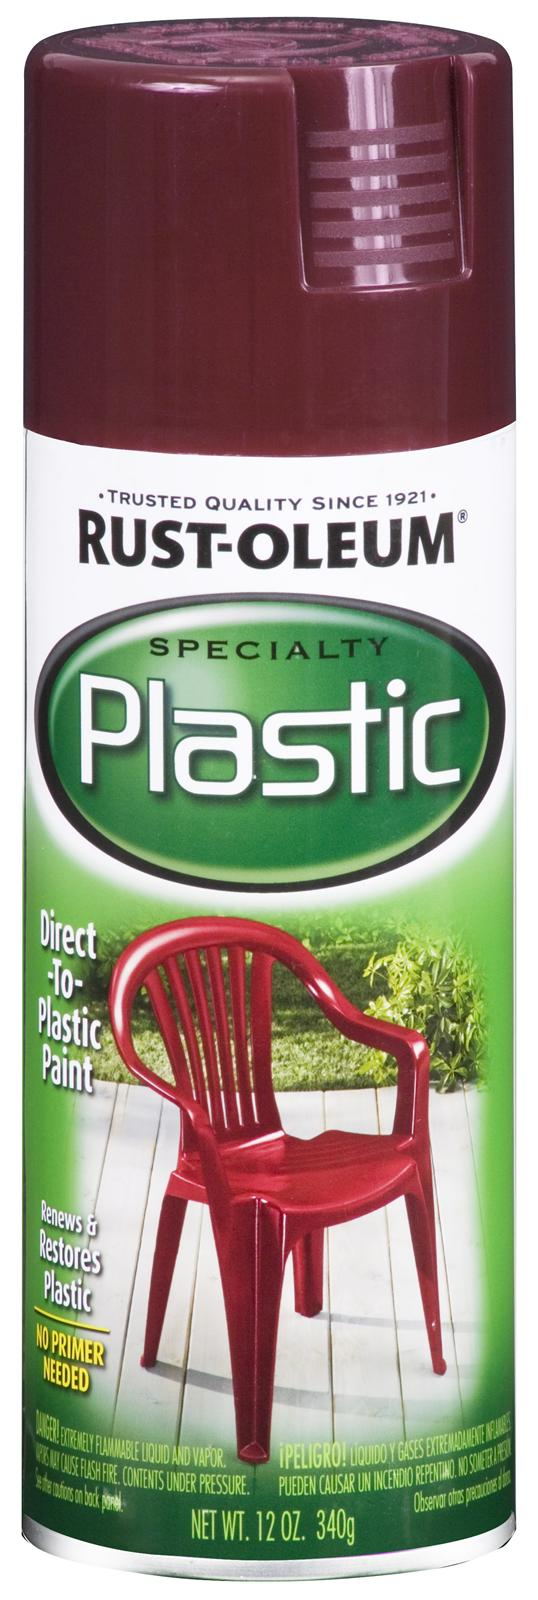 rust oleum paint for plastic sprays 211362 free shipping. Black Bedroom Furniture Sets. Home Design Ideas